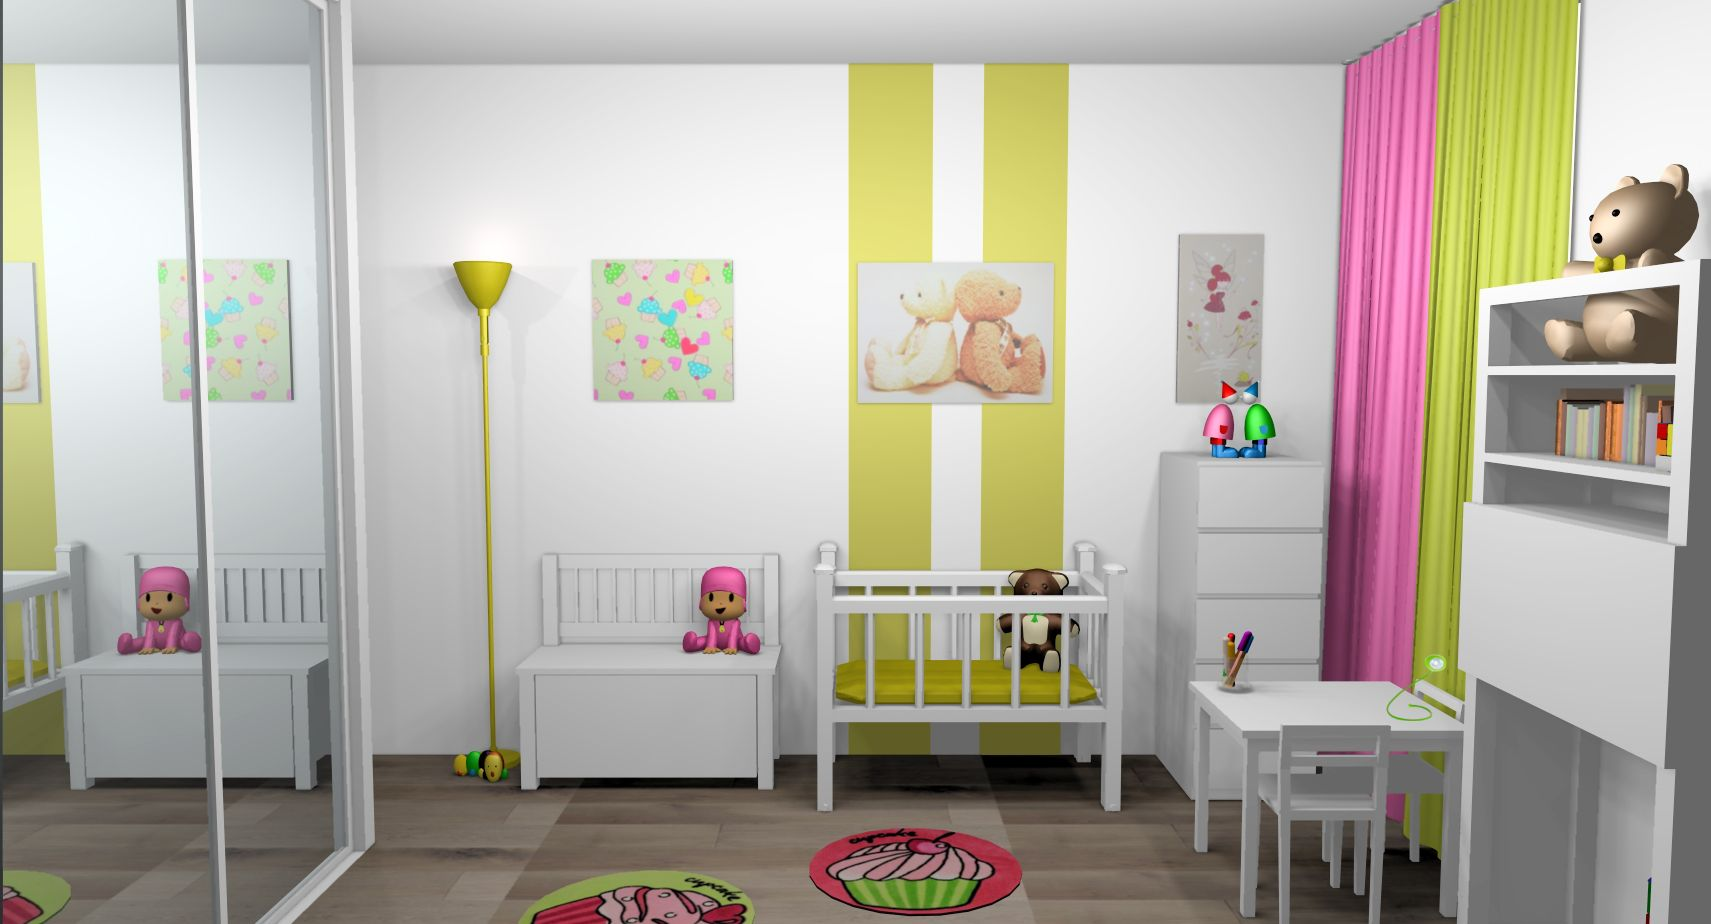 chambre mixte fille bb bandes peinture touches vert anis rose 3jpg 1711924 chambre bb pinterest - Deco Chambre Mixte Fille Garcon